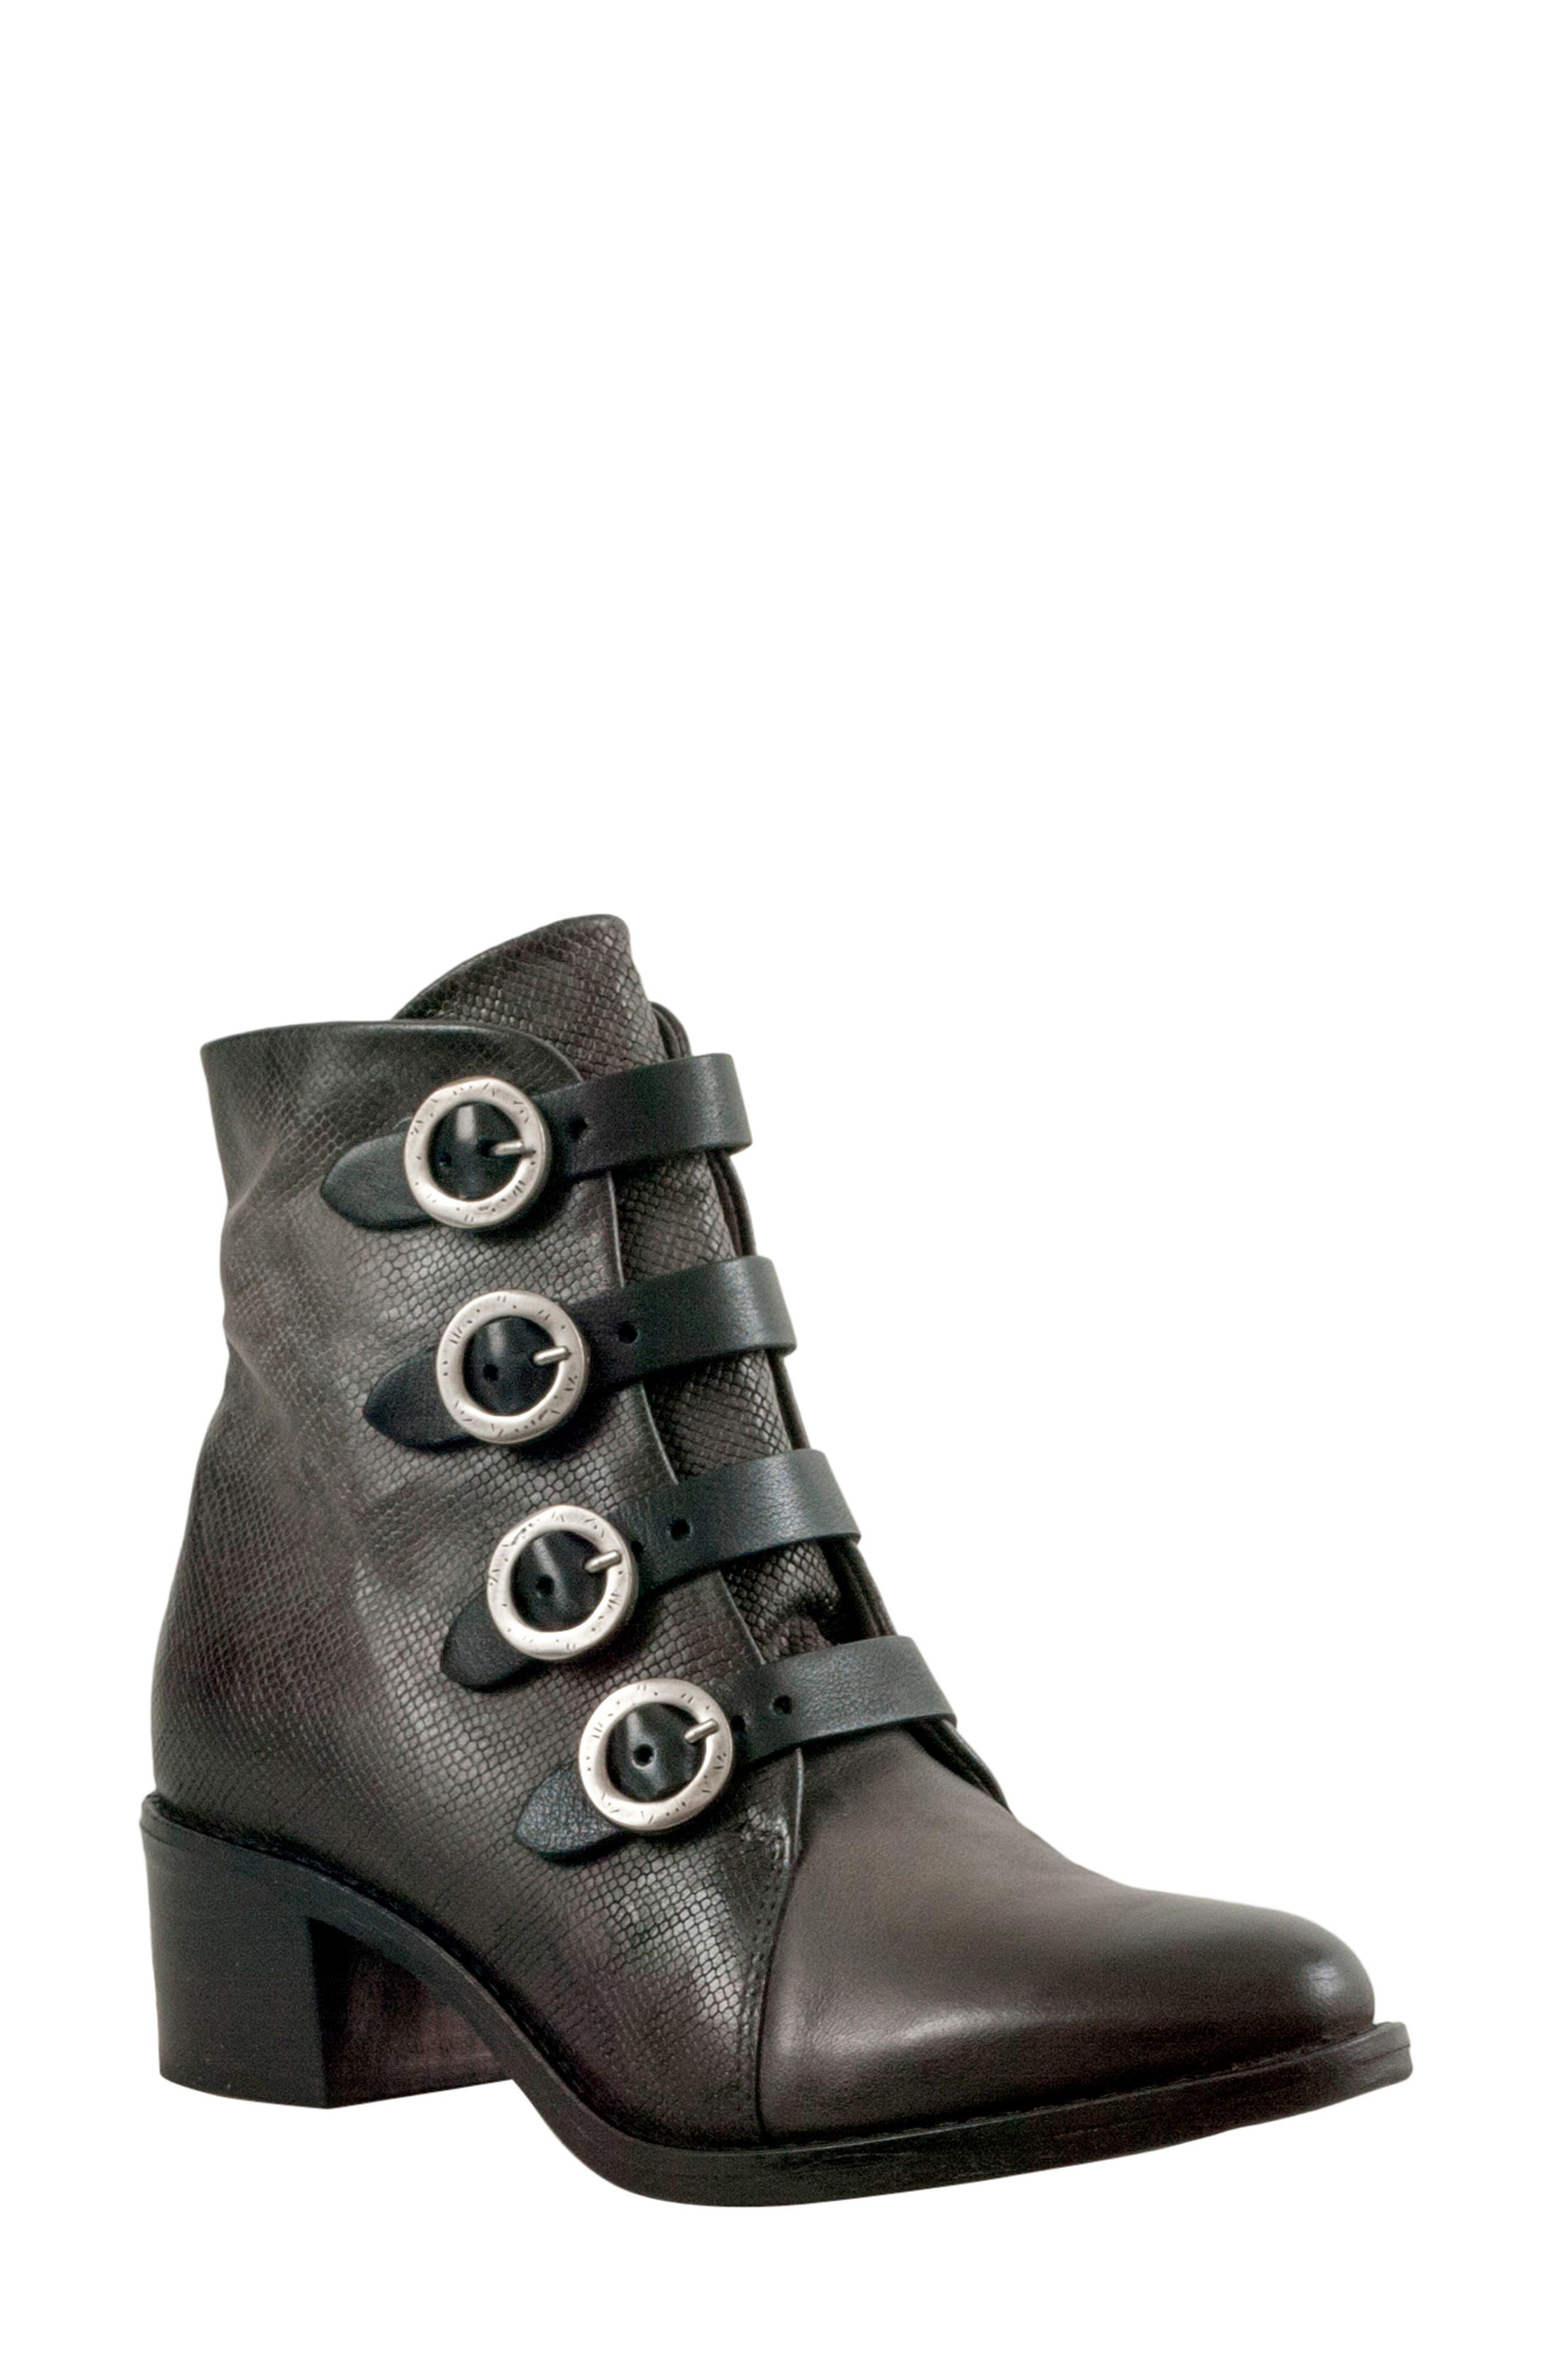 Miz Mooz Fawn Boot